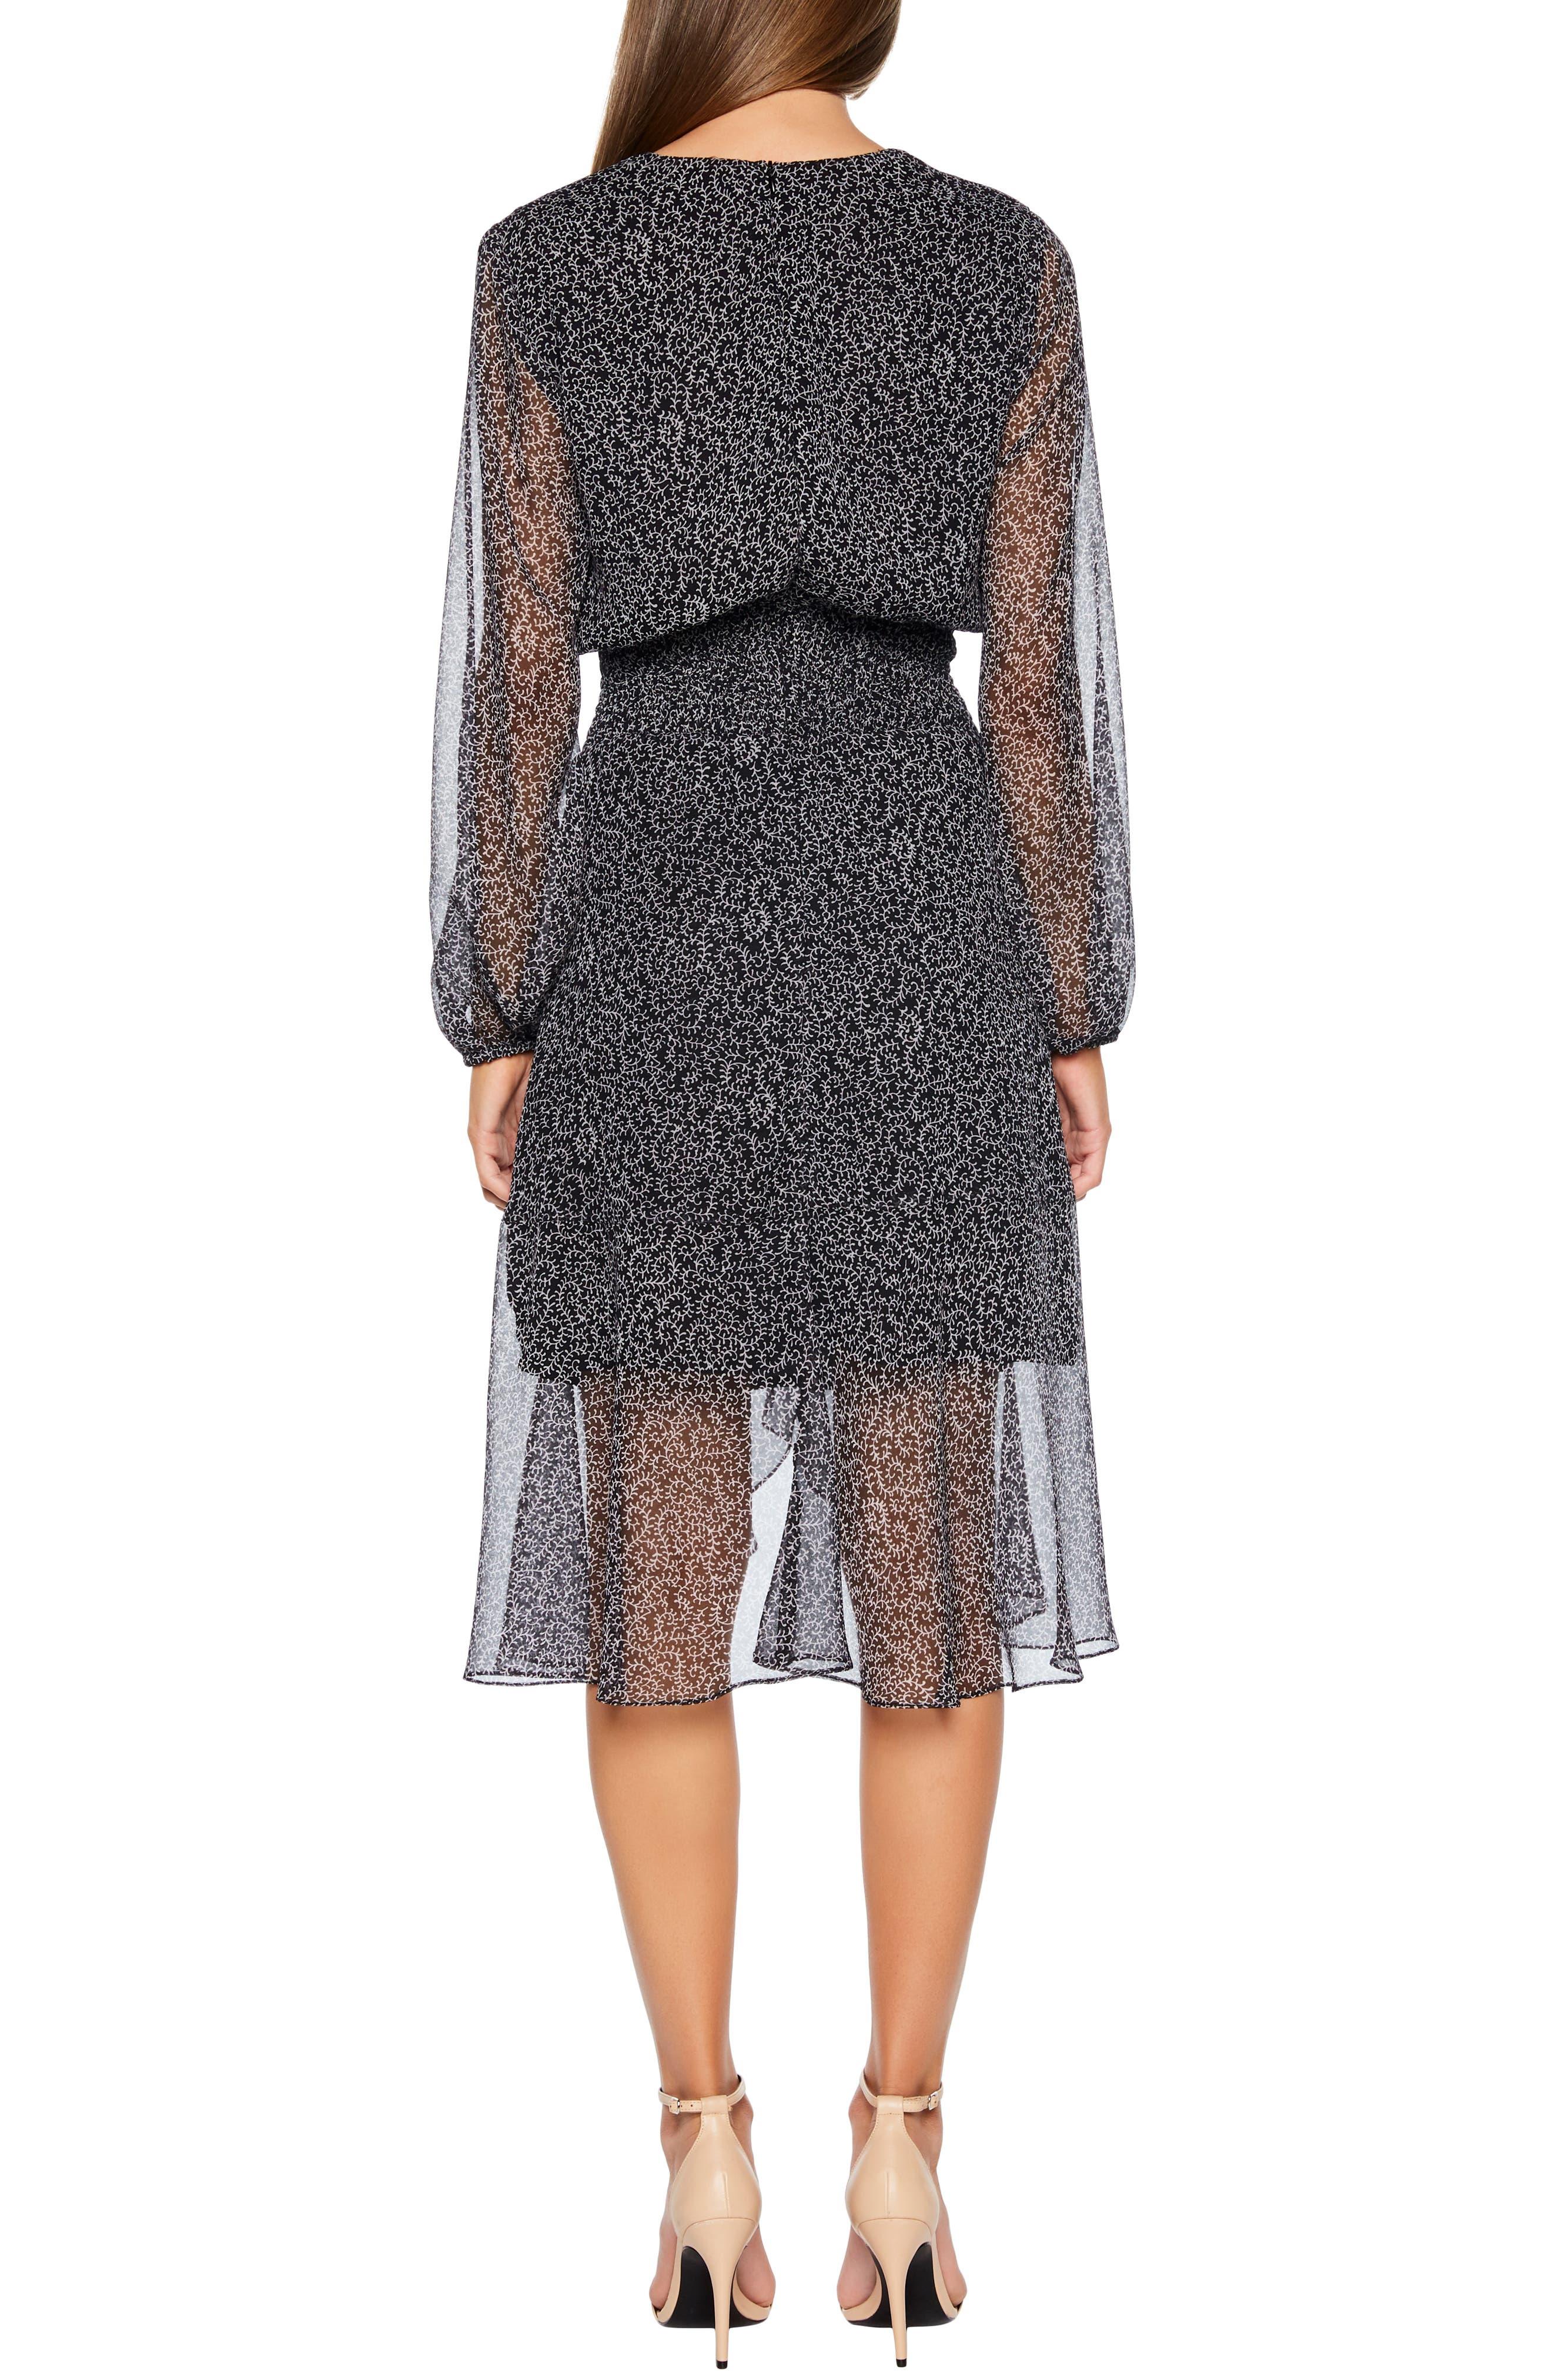 BARDOT,                             Sally Faux Chiffon Wrap Dress,                             Alternate thumbnail 2, color,                             ABSTRACT PAISLEY